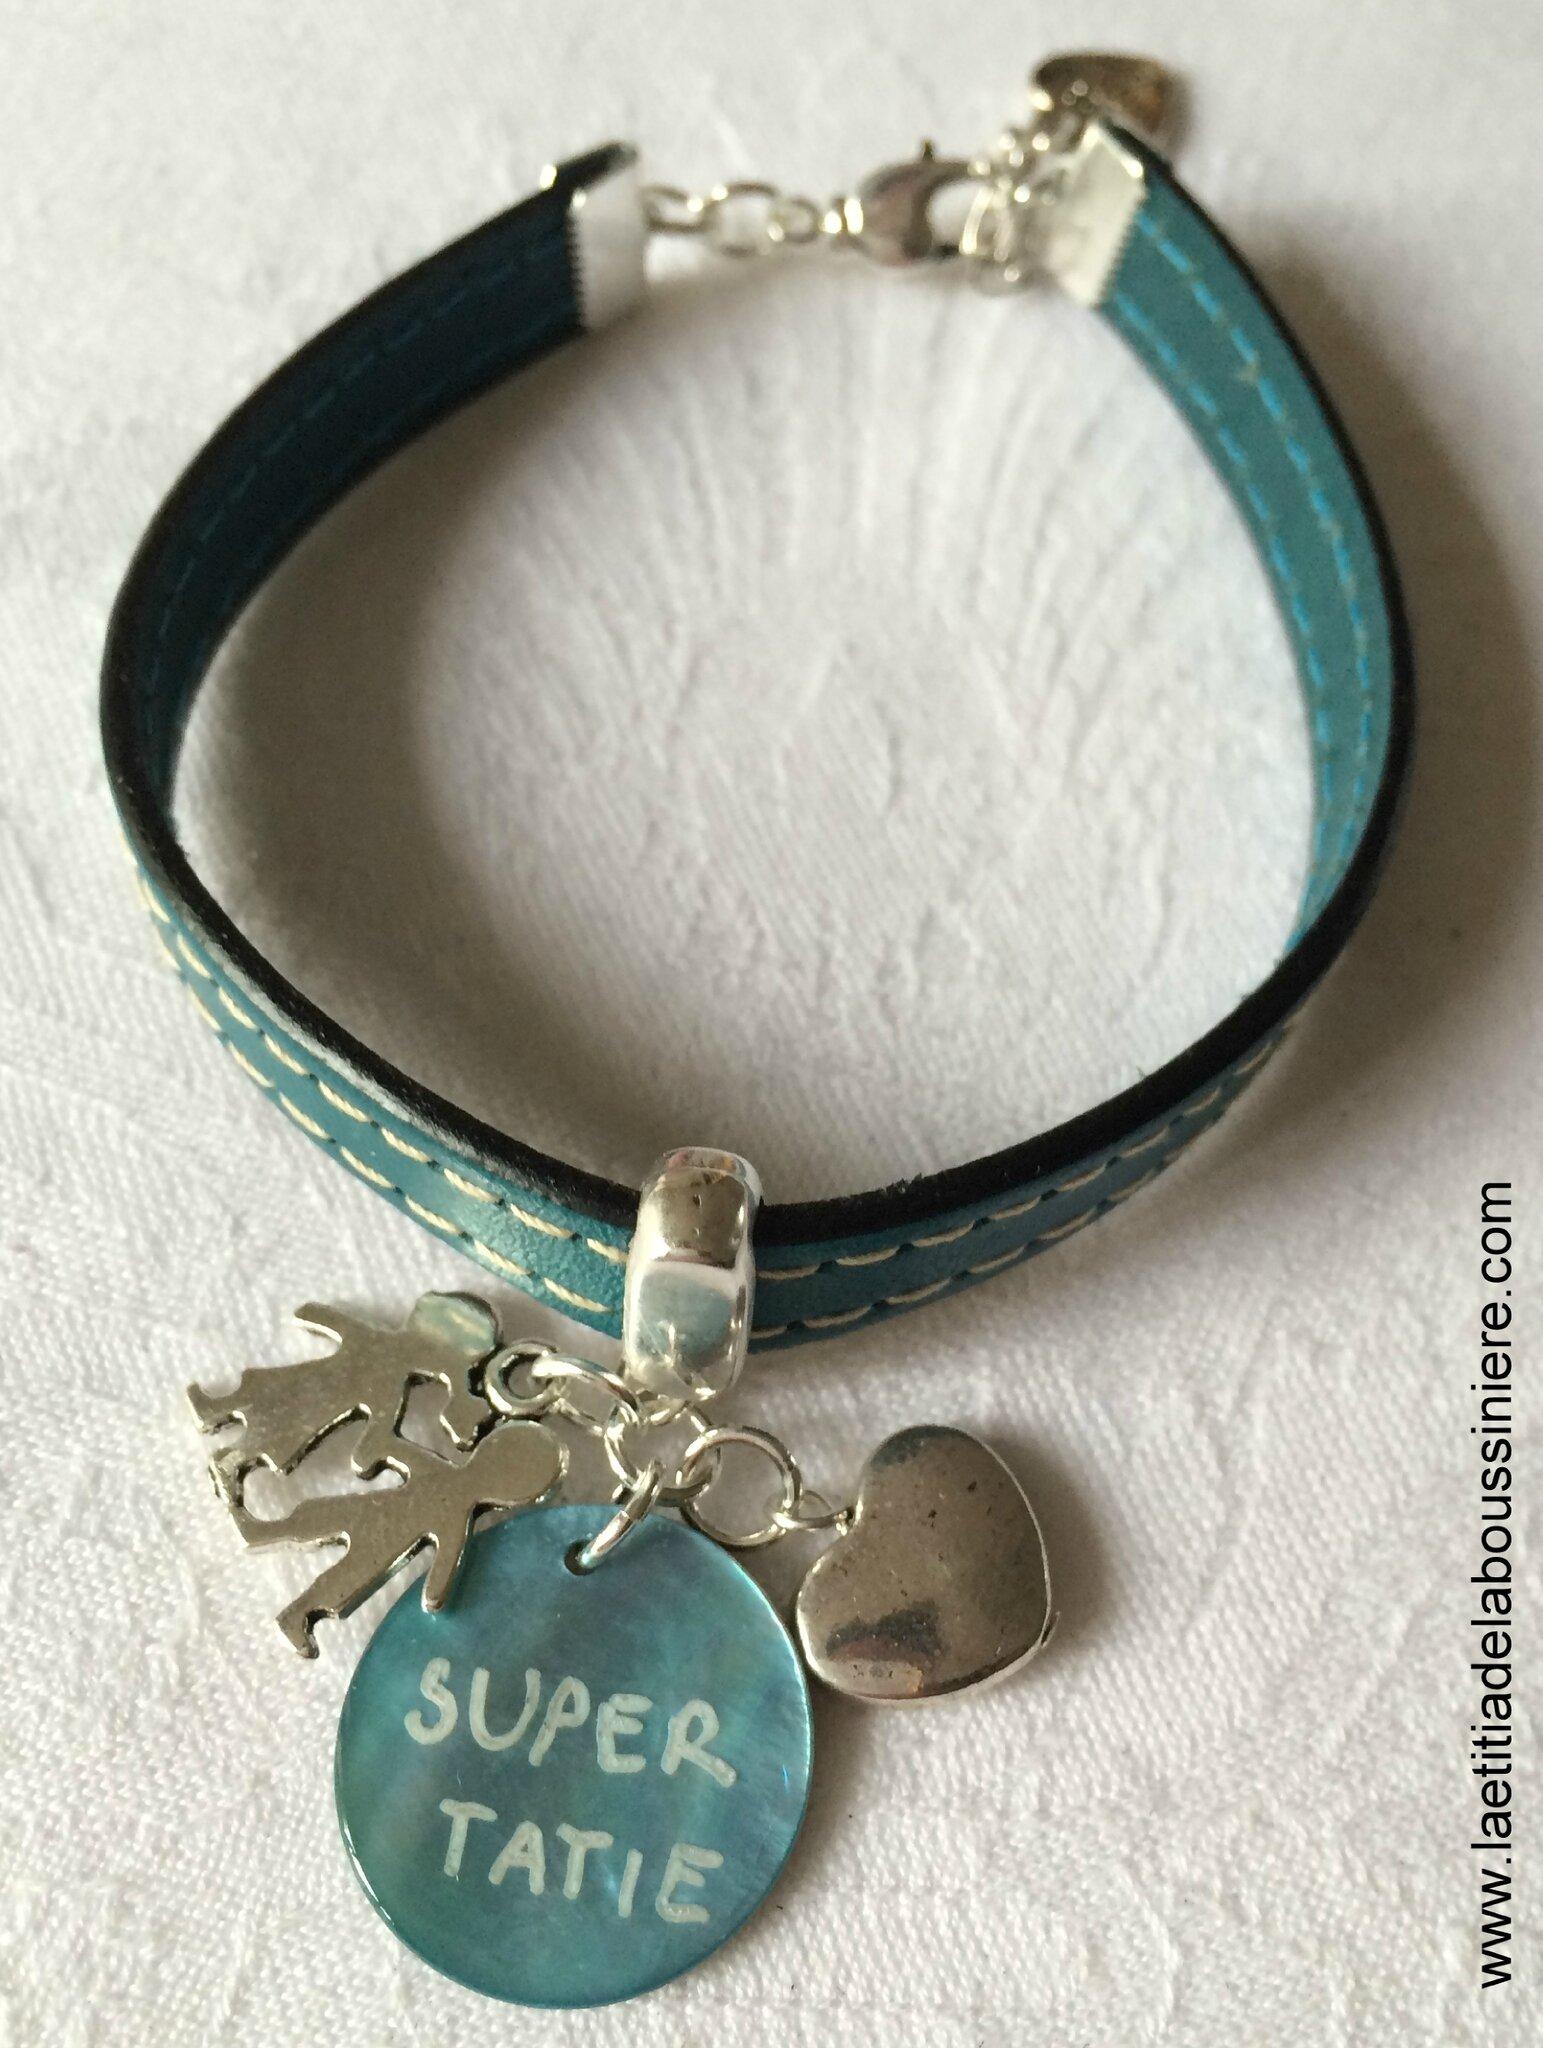 Bracelet en cuir Super Tatie (turquoise) - 22 €